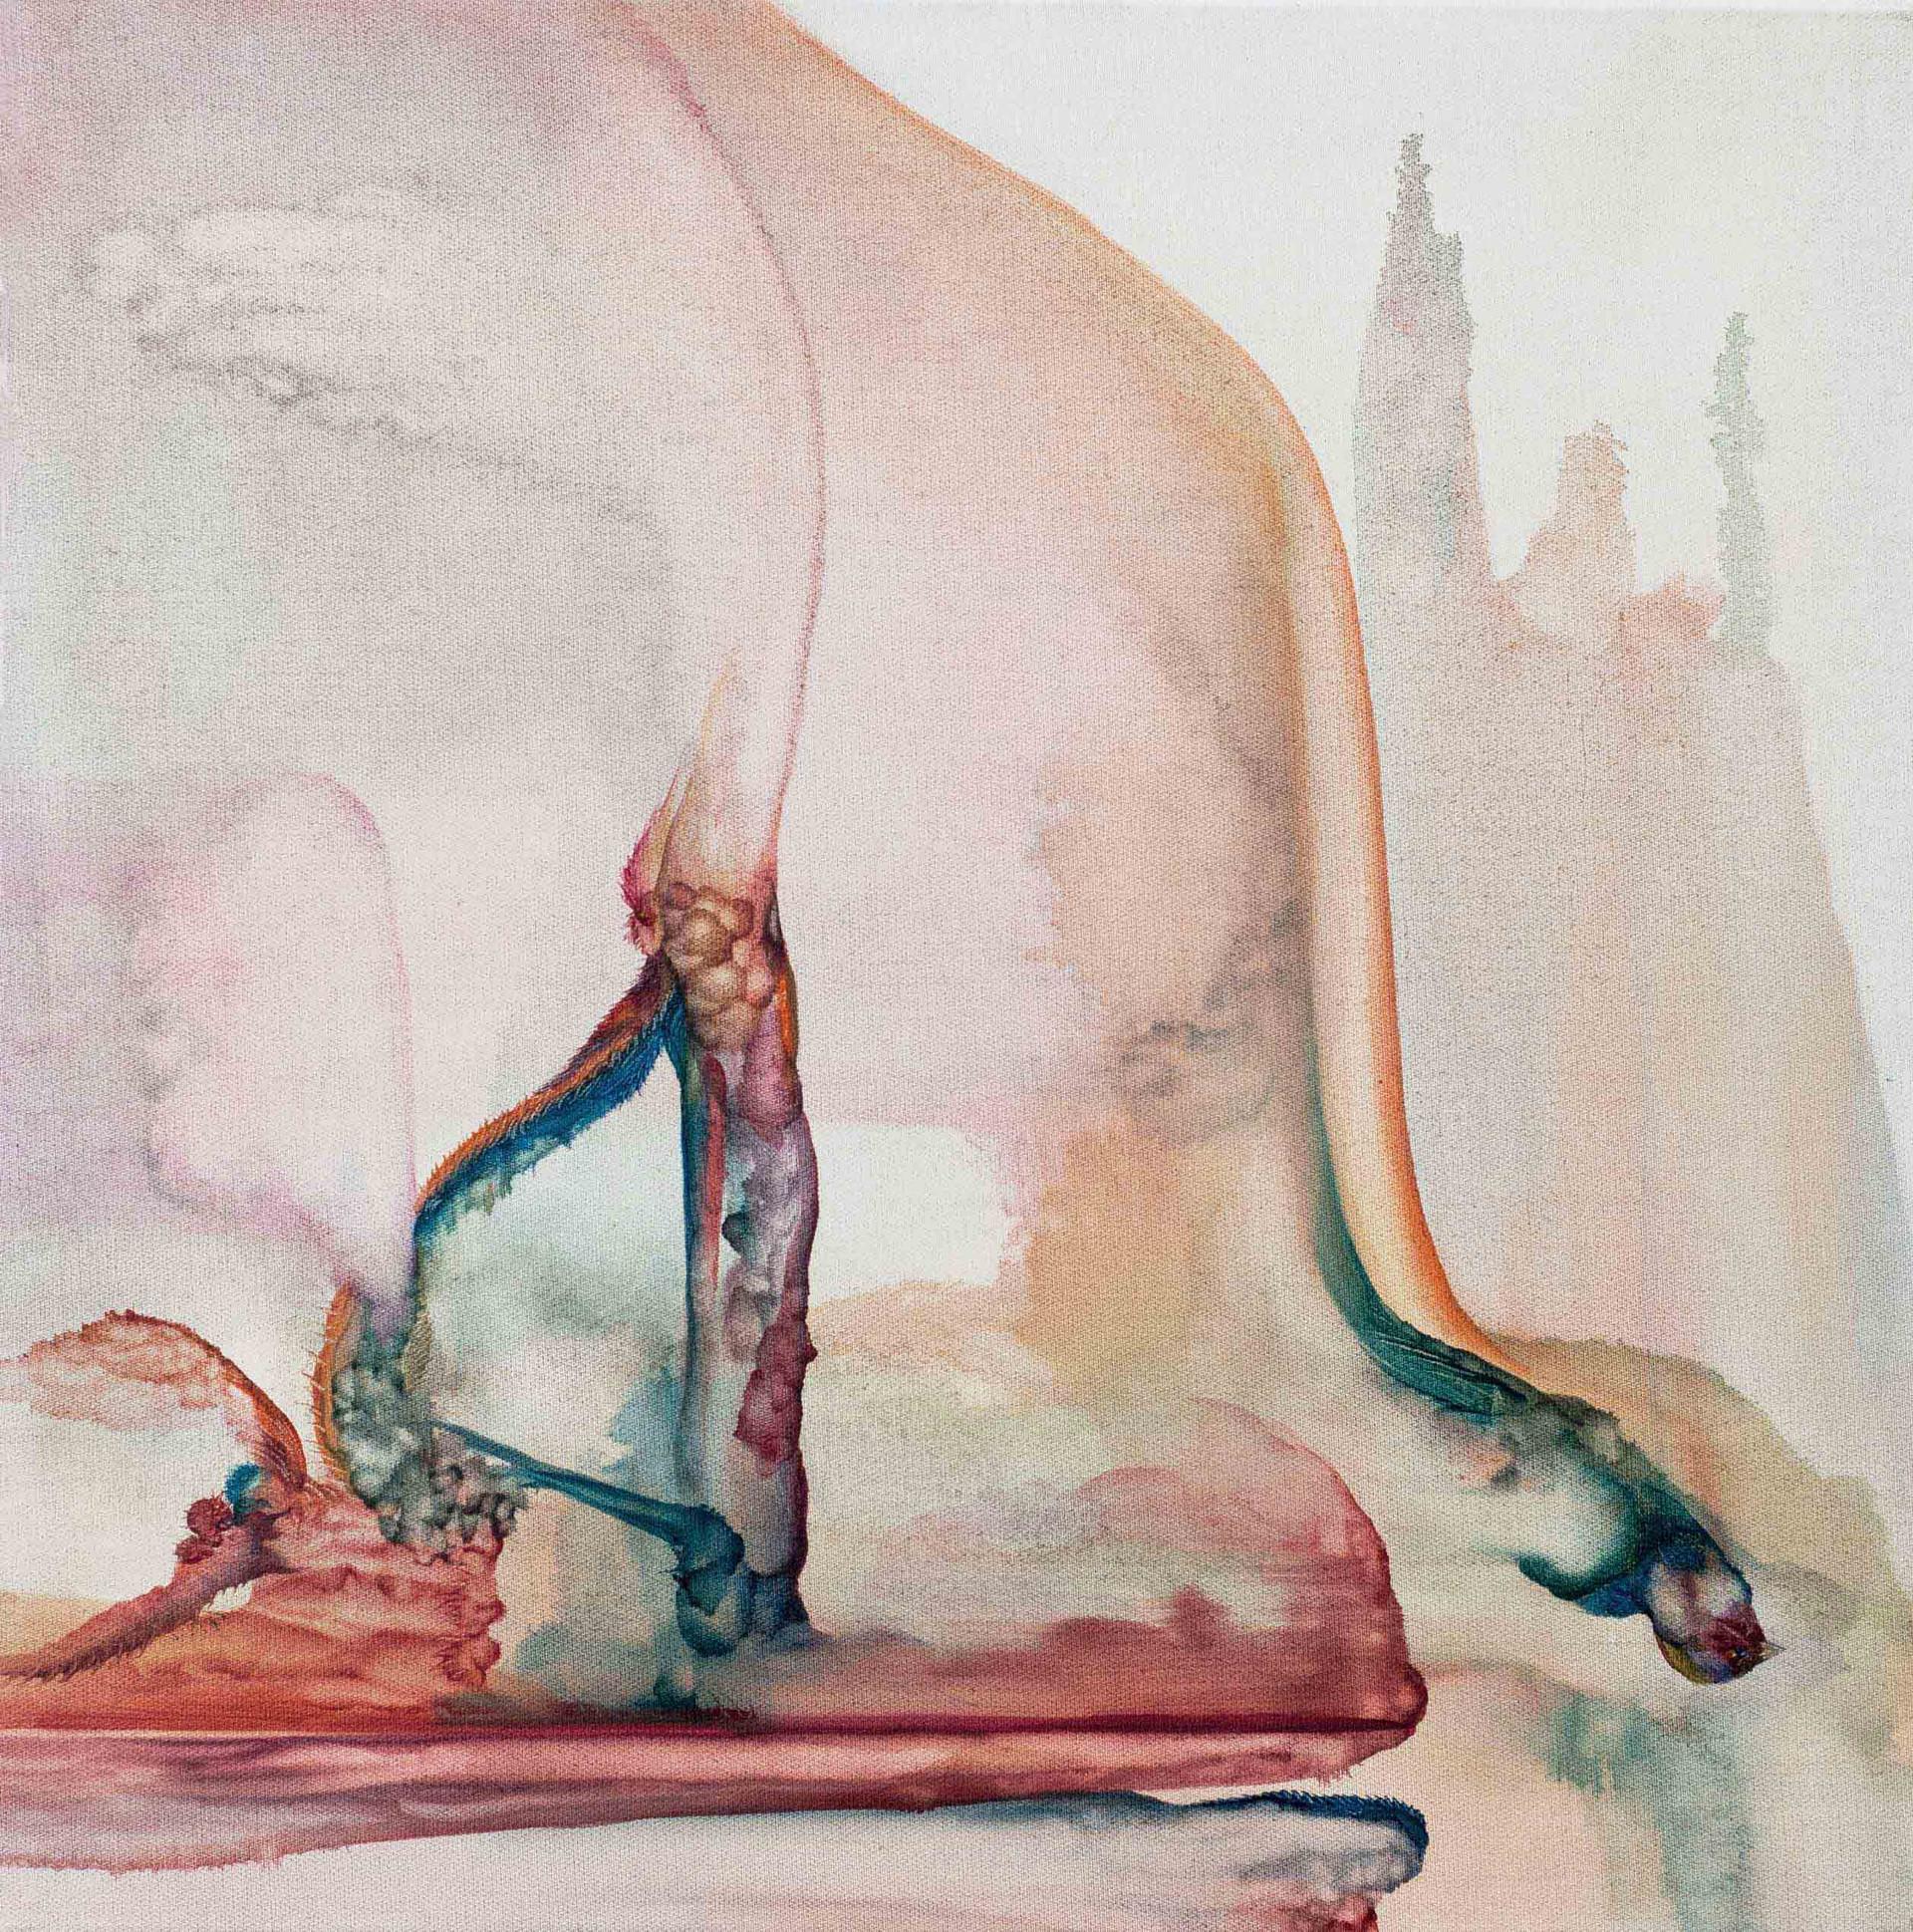 Sibelius 2015 60x60cm Oil on canvas